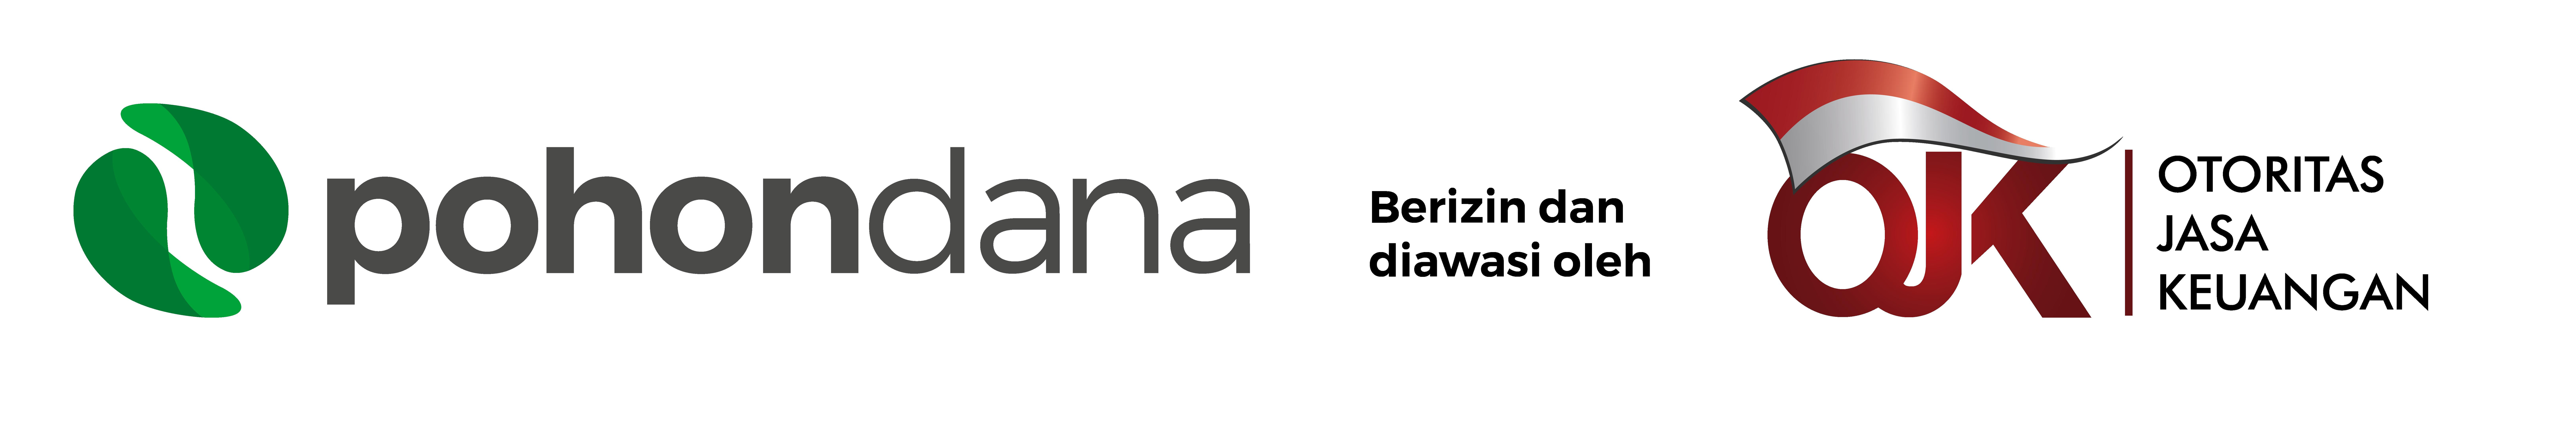 Logo Pohon Dana